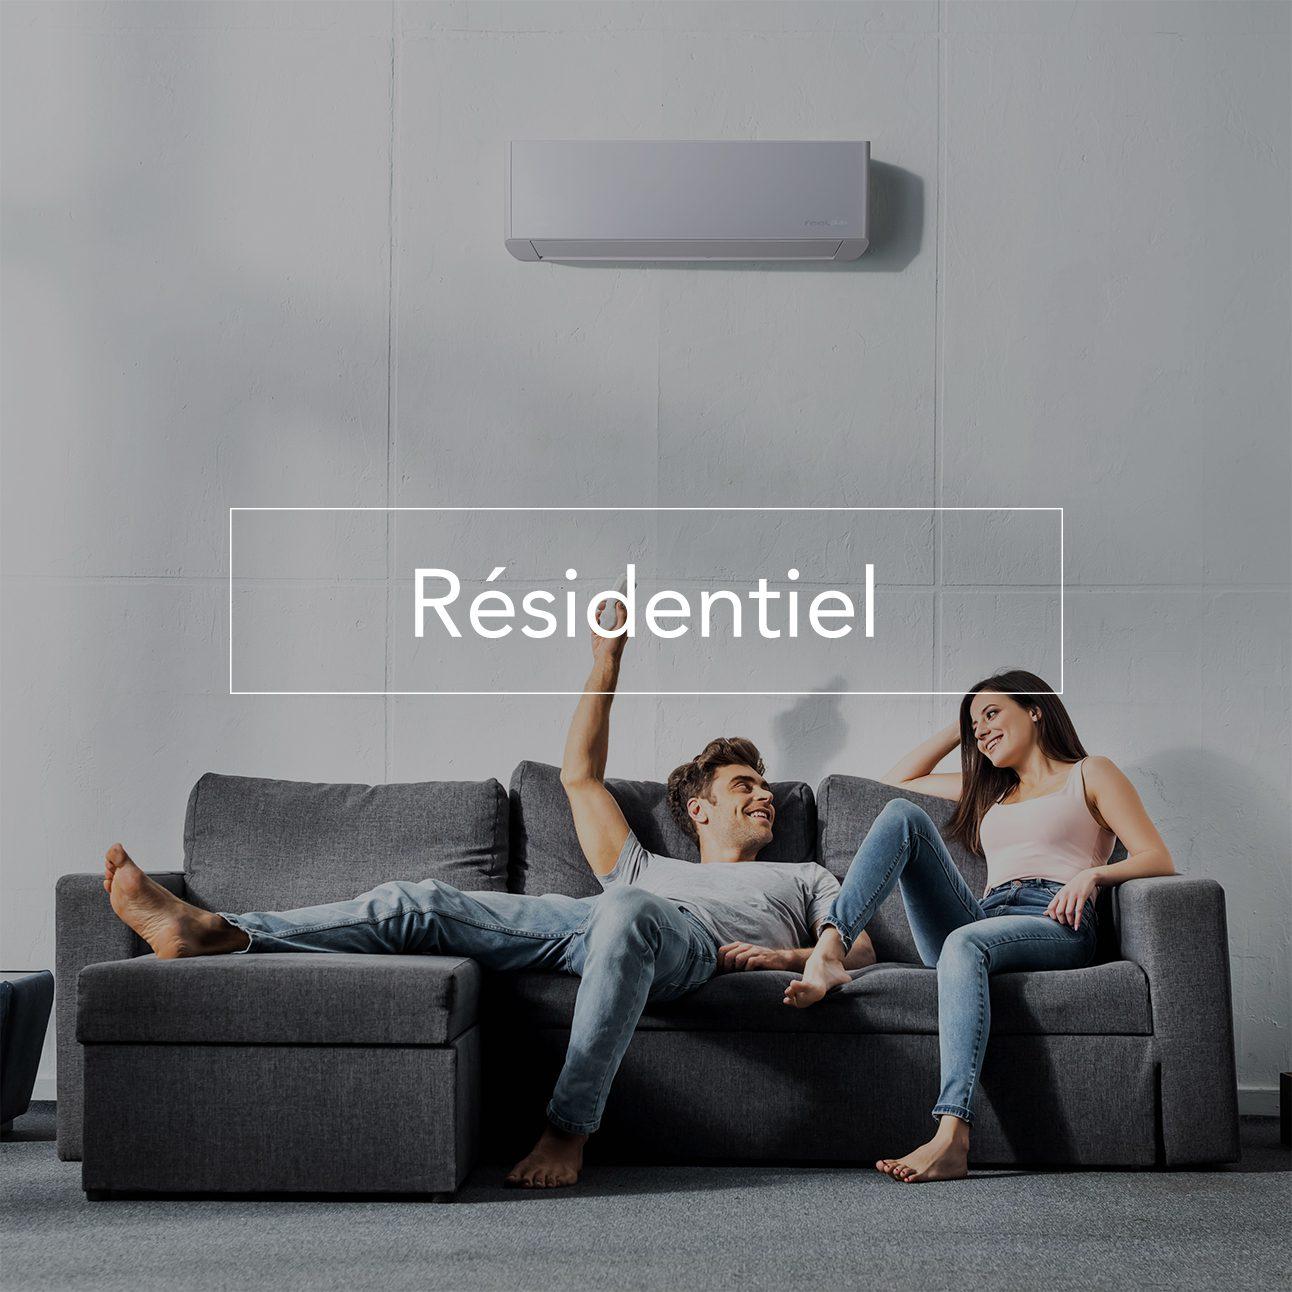 eca technology residential sector, eca technology settore residenziale, eca technology secteur résidentiel